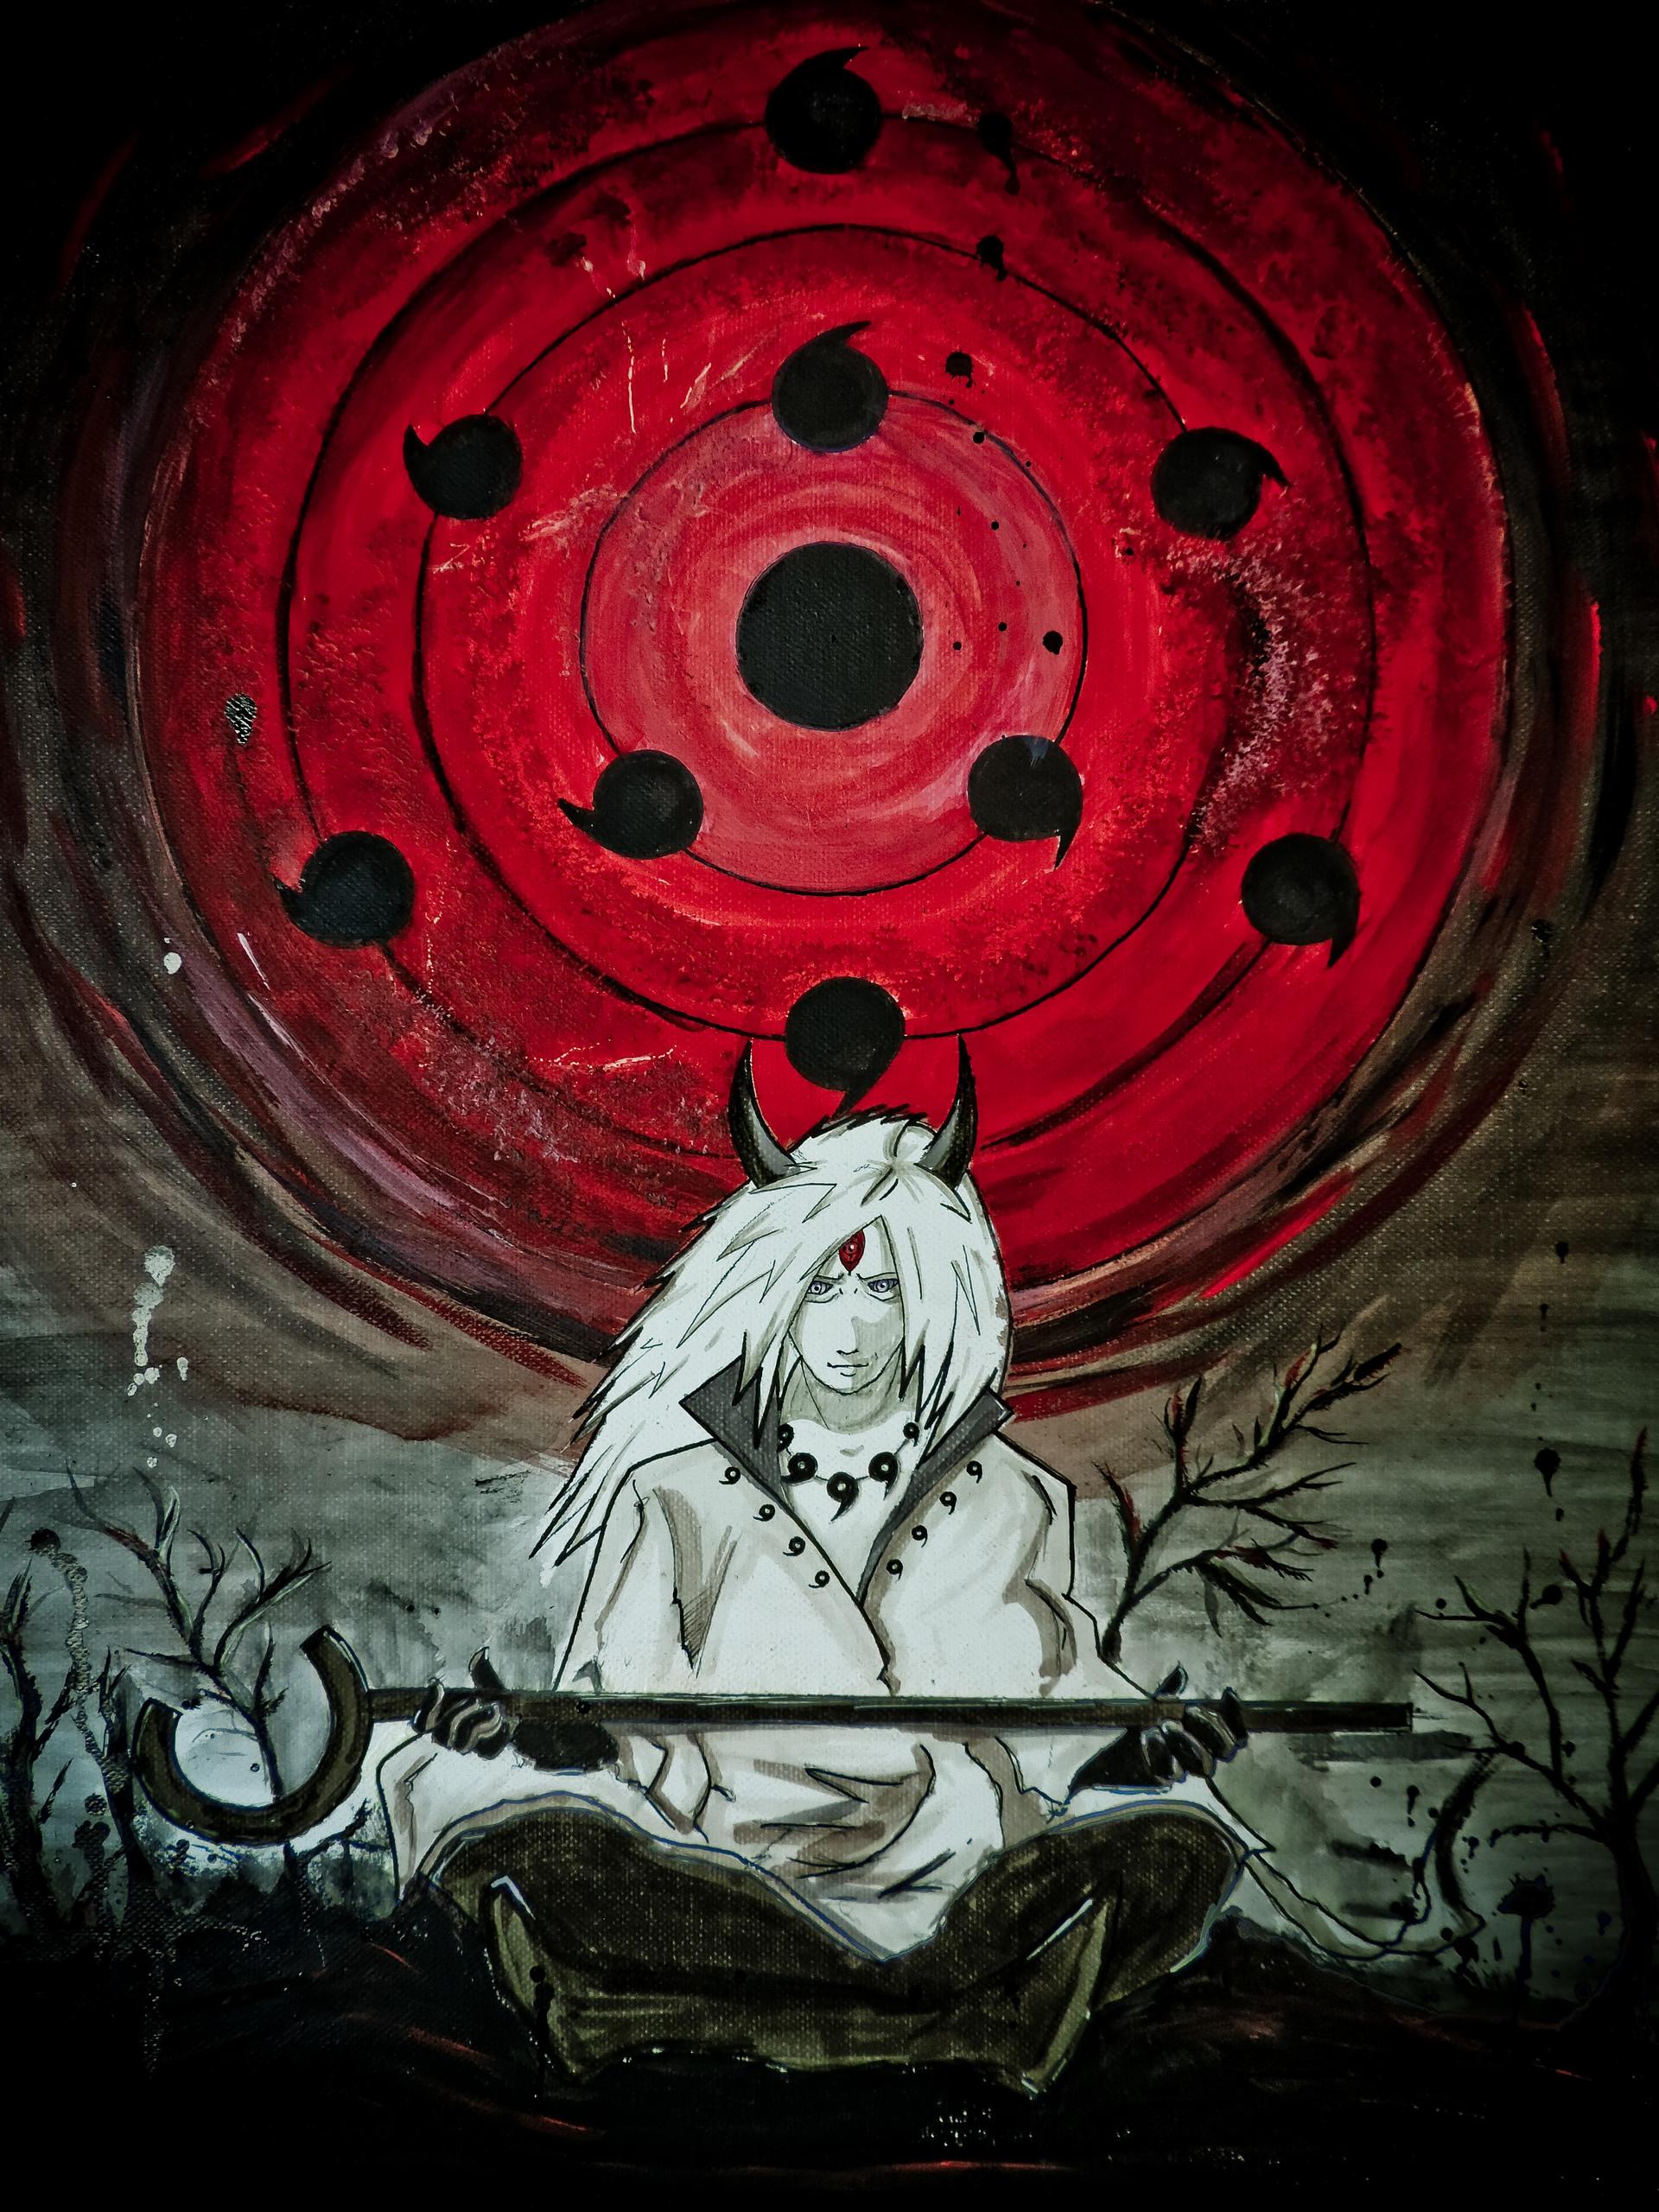 gabito lopez zelaya madara uchiha full moon eye